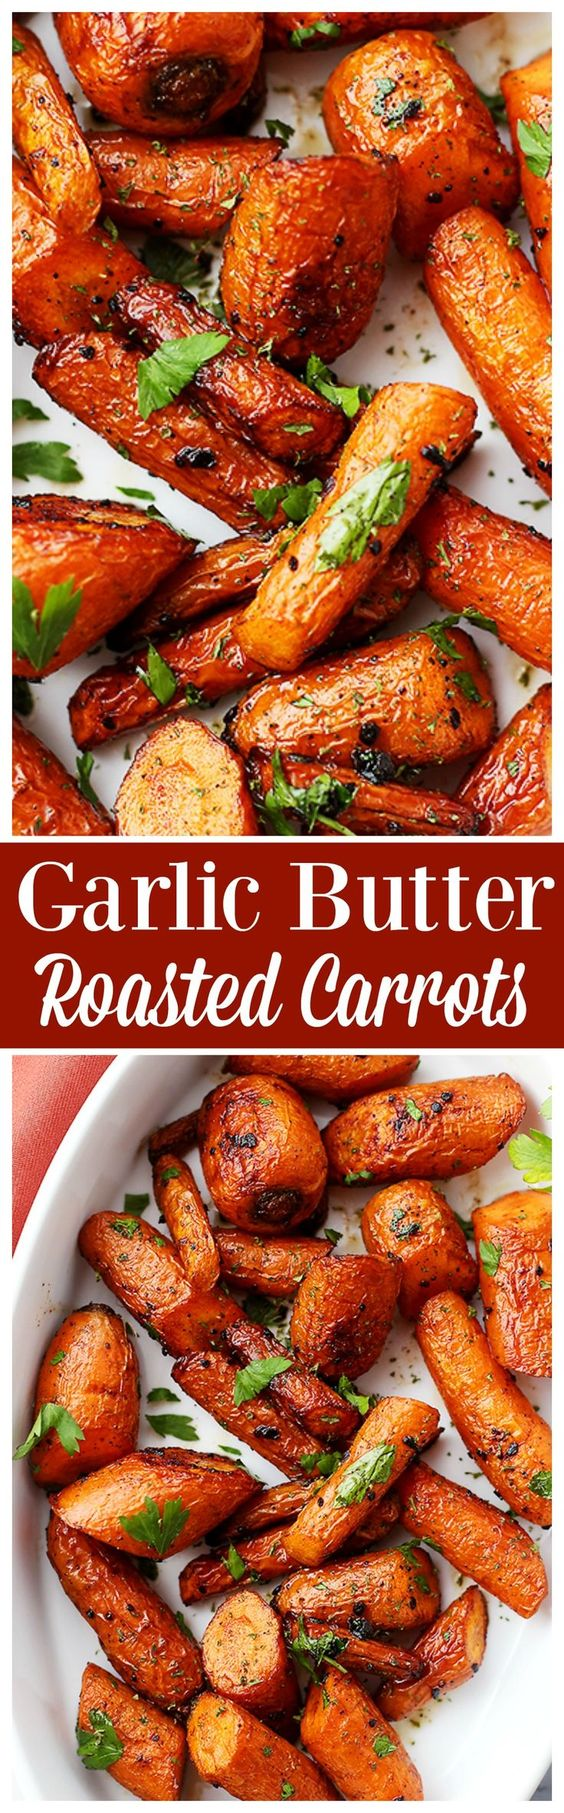 Garlic Butter Roasted Carrots.